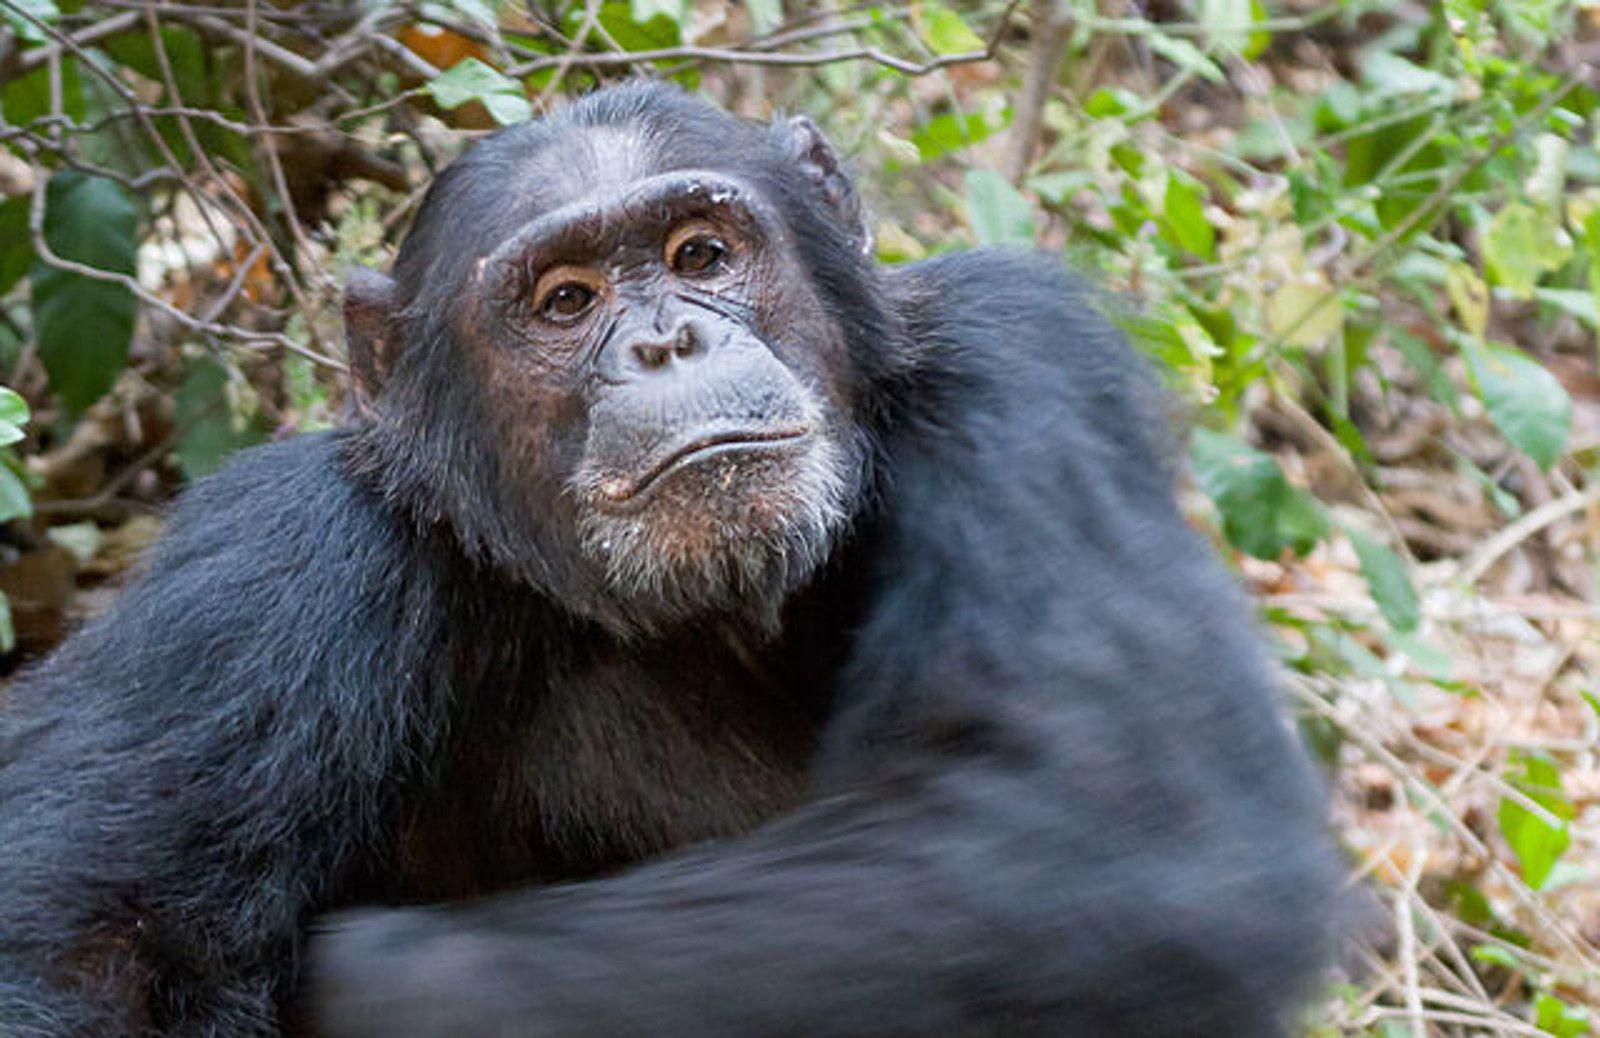 Senate Passes the Captive Primate Safety Act! Primates